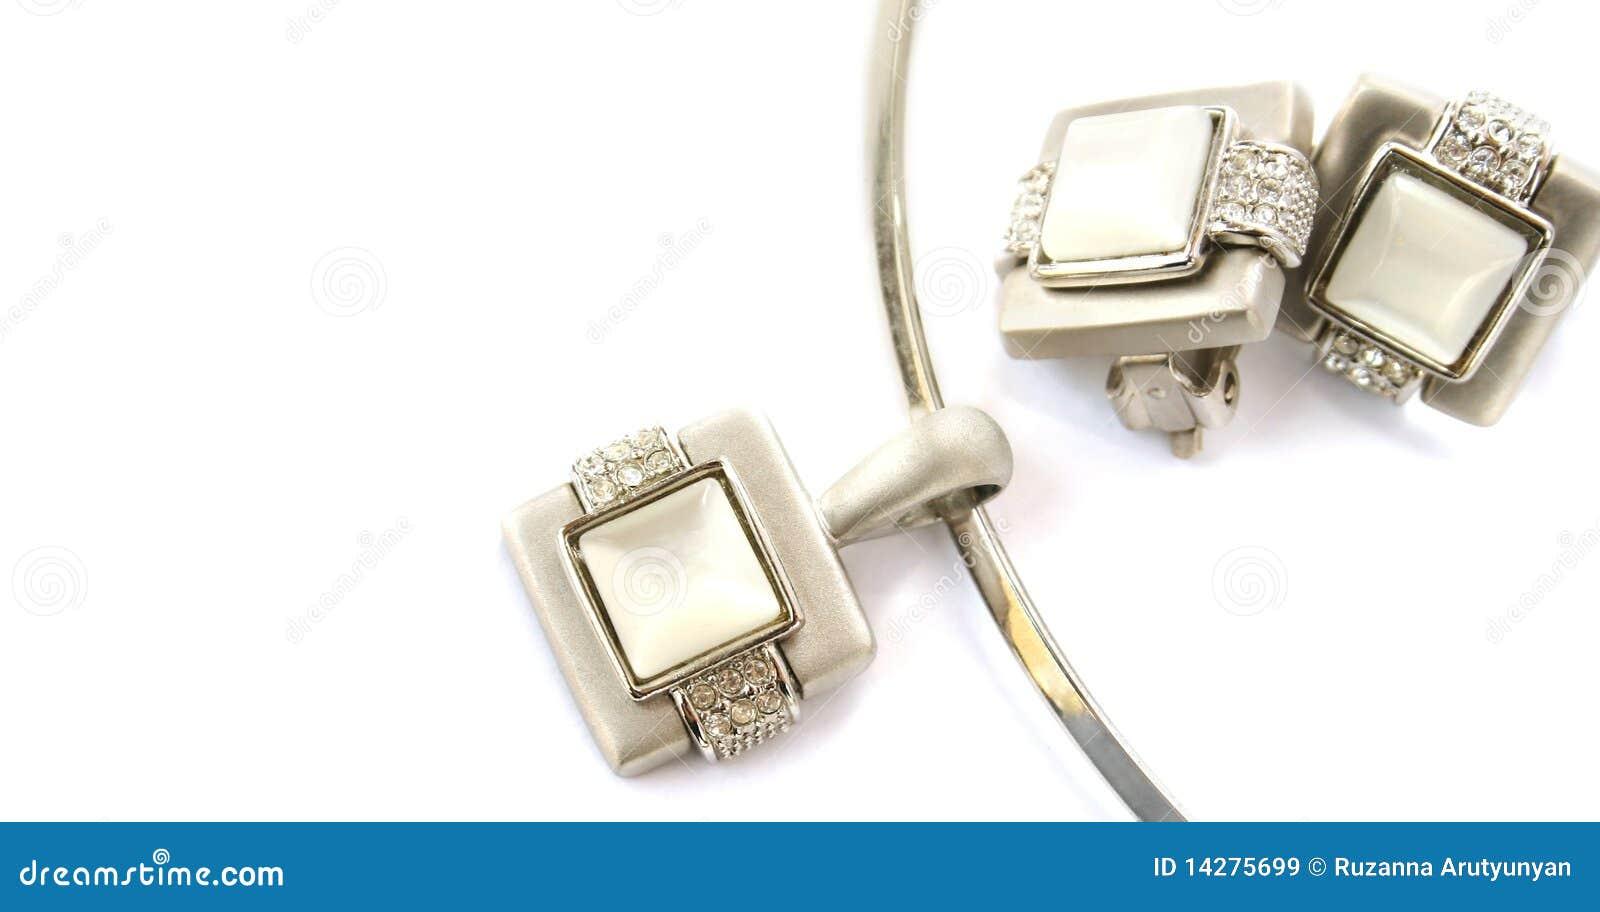 Halsband en klemmen